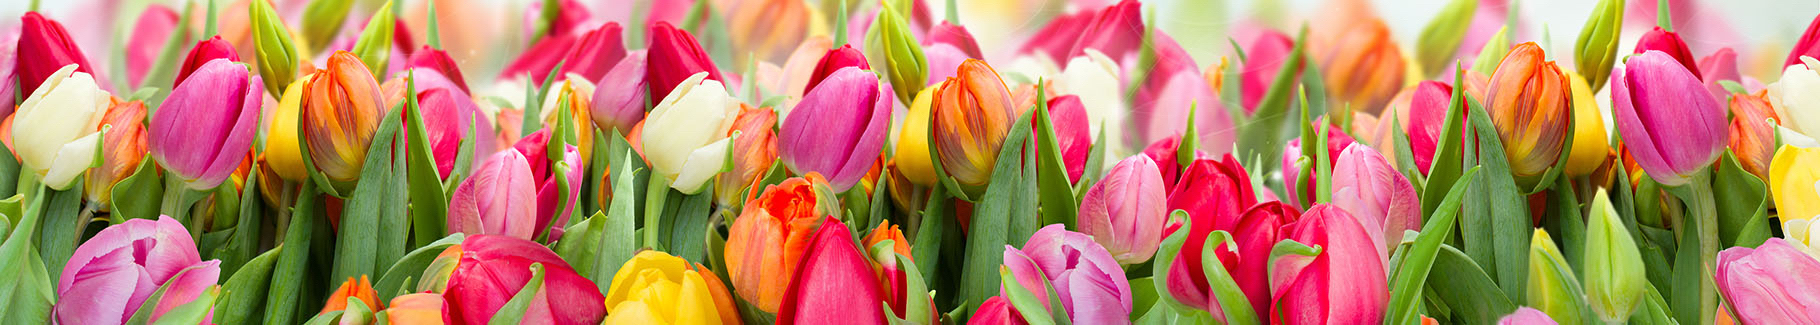 Kolorowa fototapeta tulipany